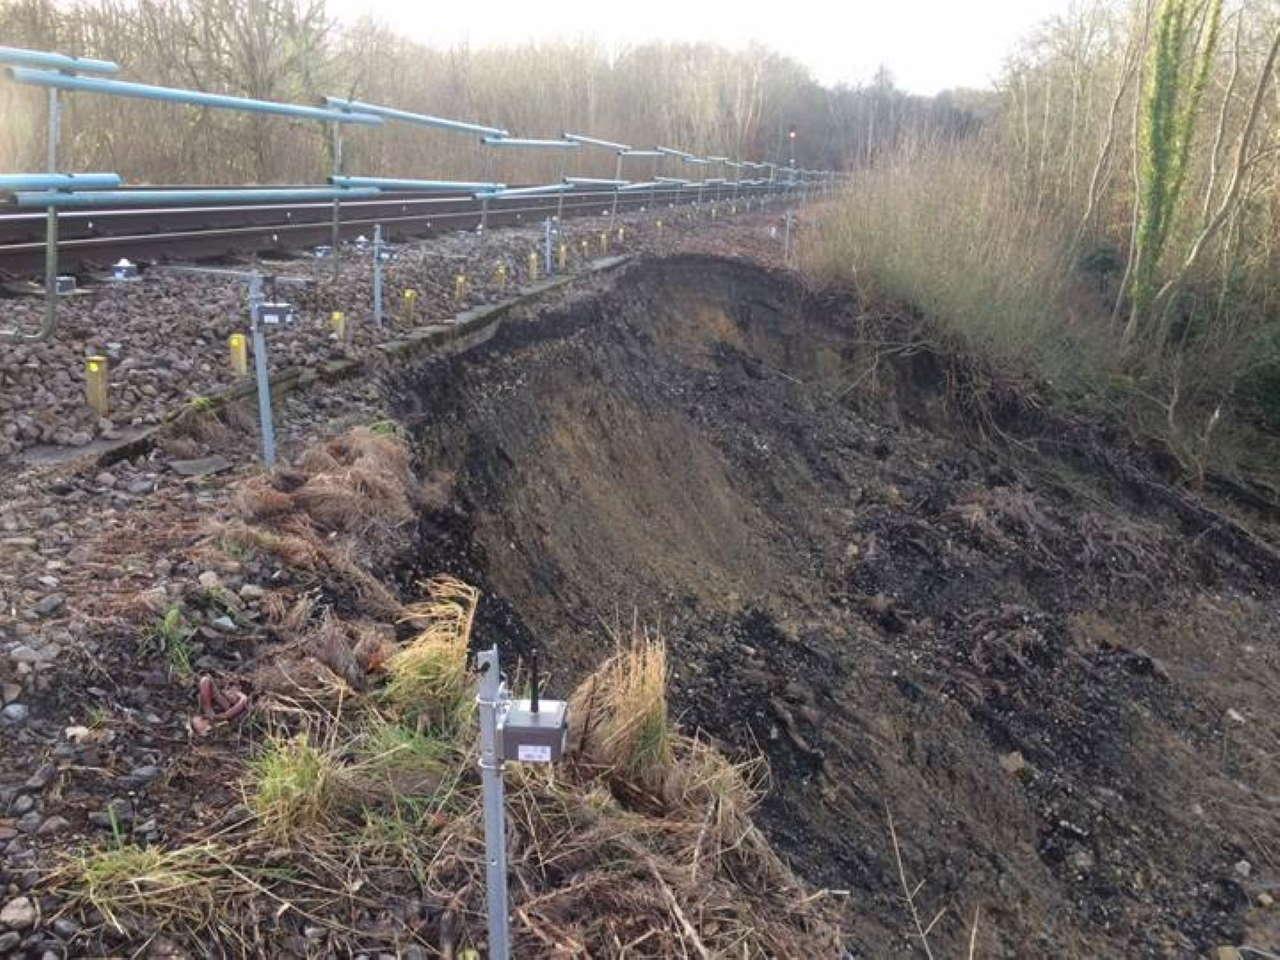 East grinstead railway closed after landslide